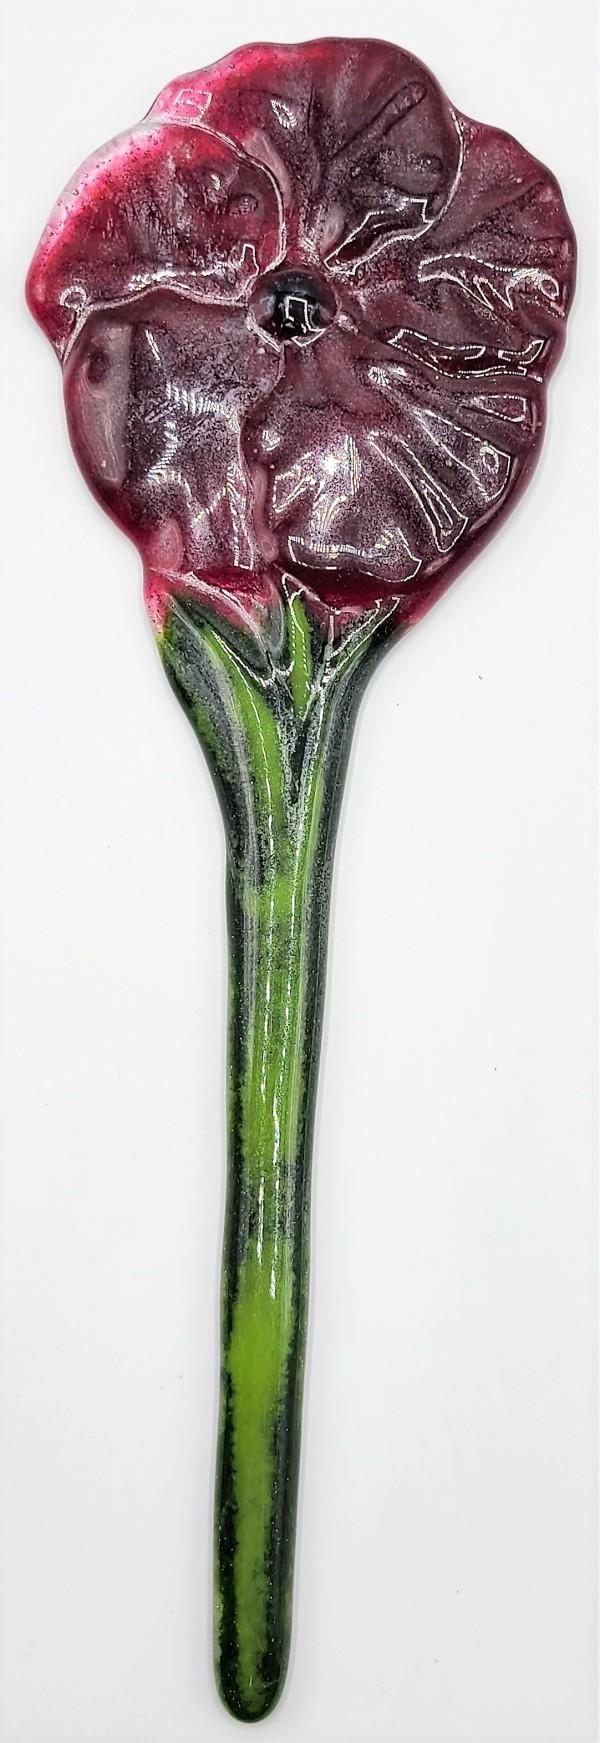 Plant Stake-Red Hibiscus Flower by Kathy Kollenburn